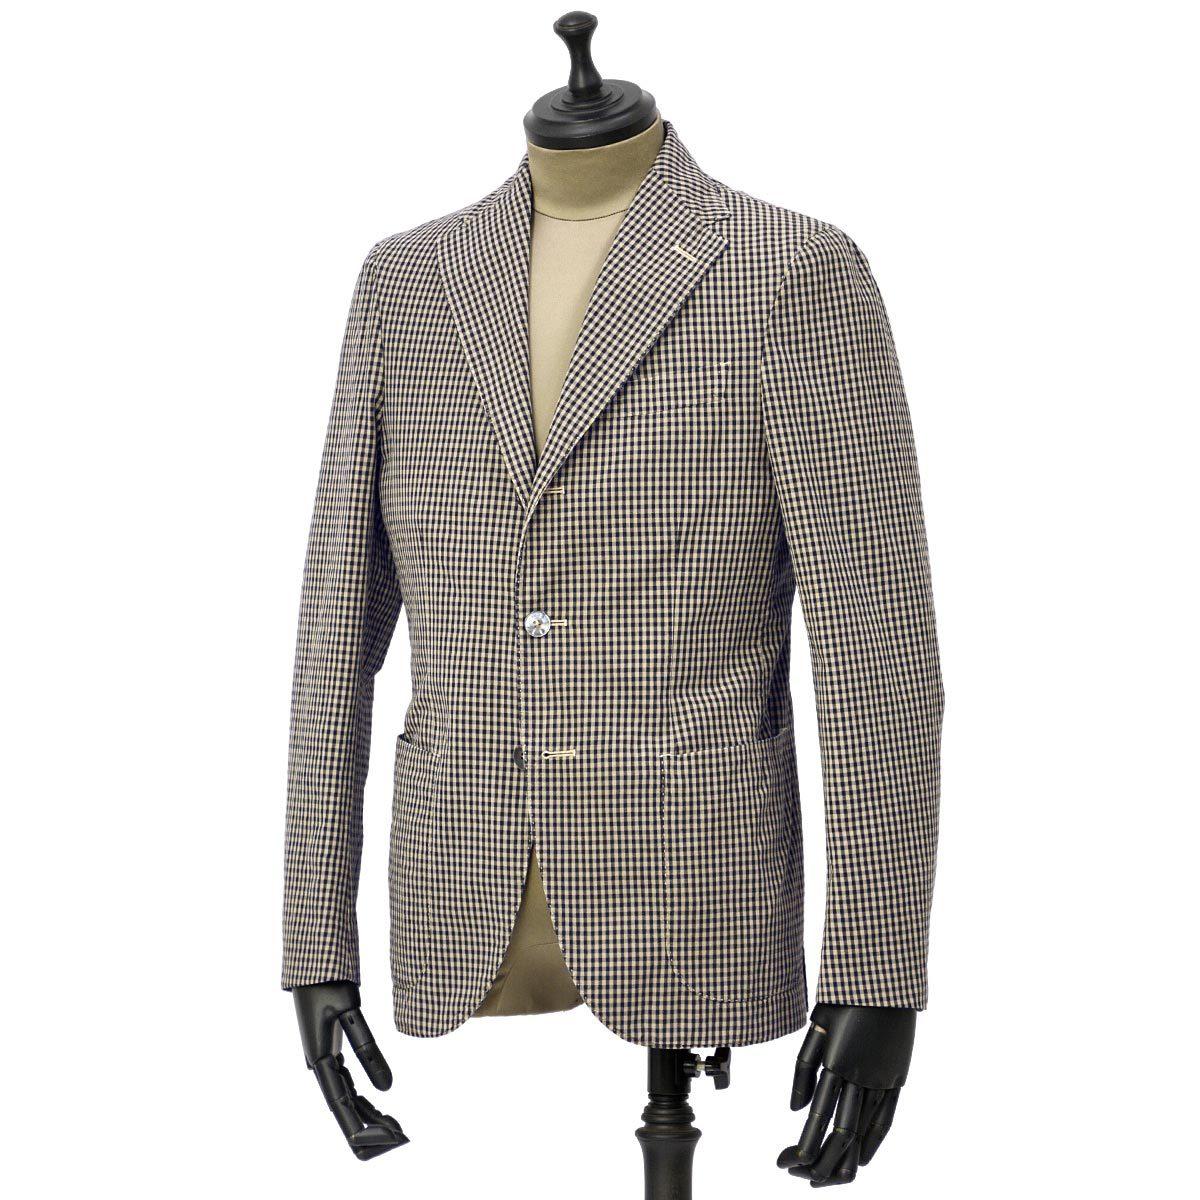 THE GIGI【ザ ジジ】シングルジャケット ART K601 200 コットン ギンガムチェック ブラウン ブラック